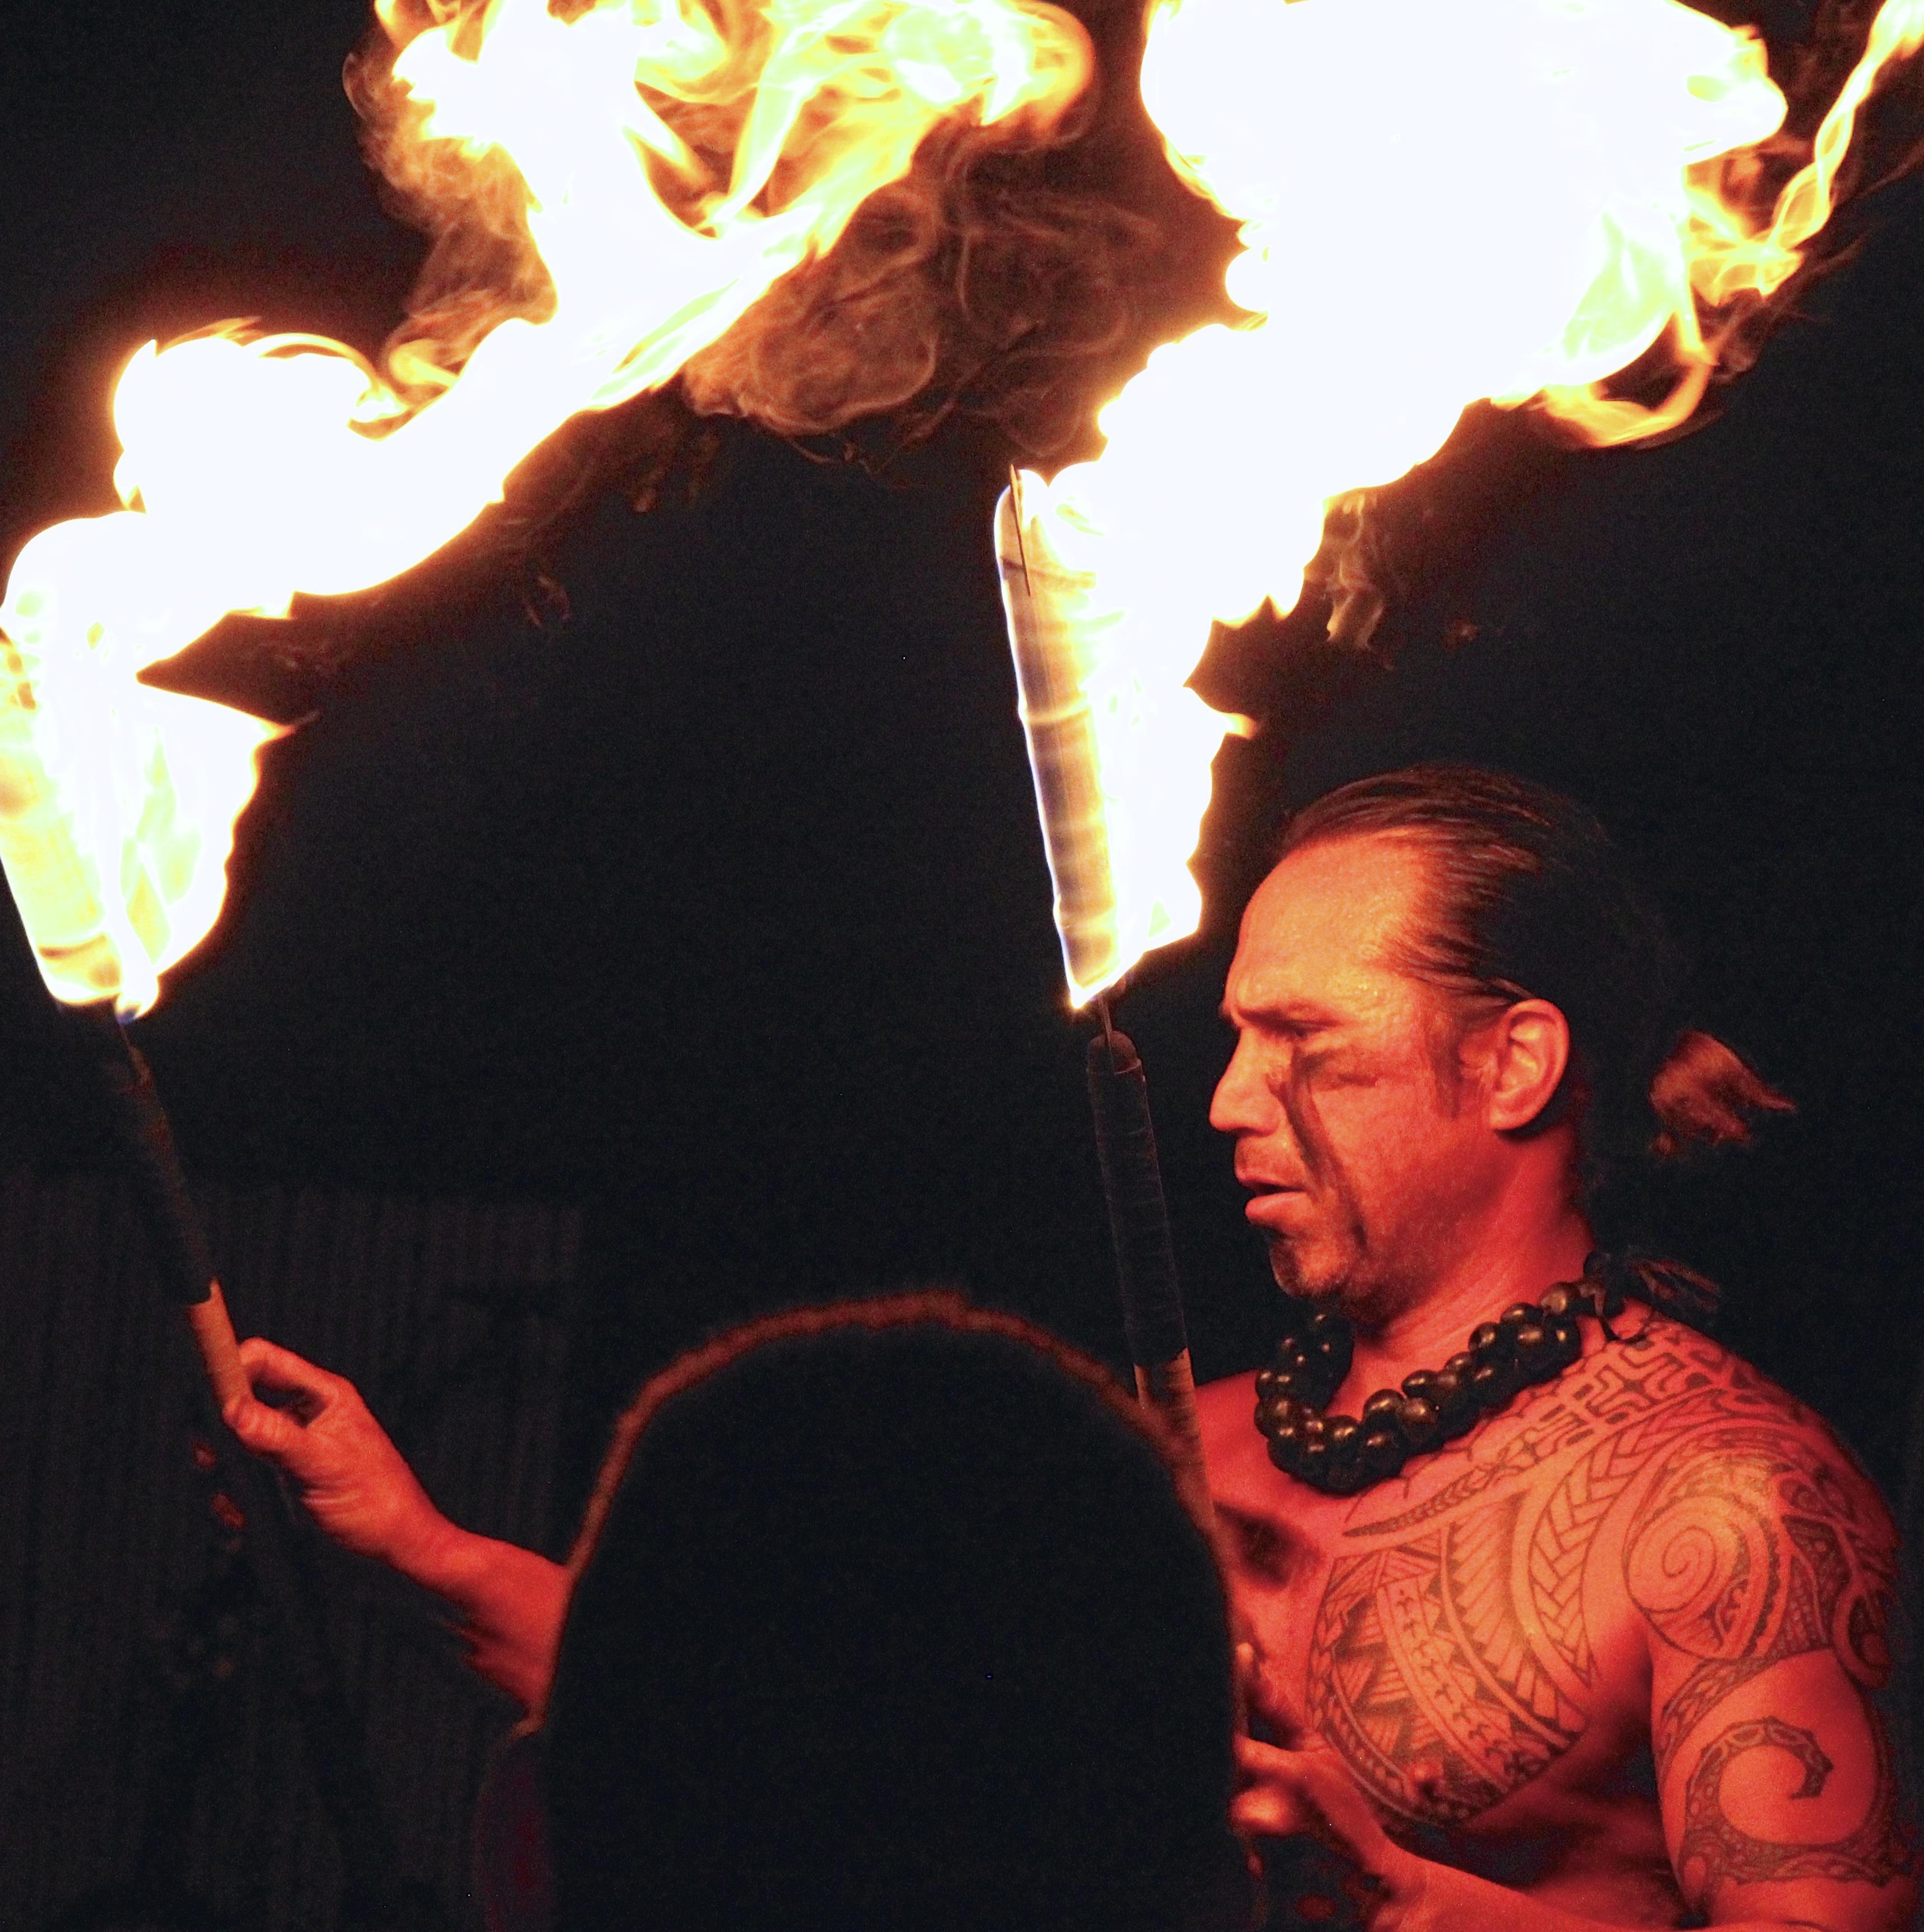 Fire dancer at Mauna Kea Luau. Photo Credit: Tom Wilmer